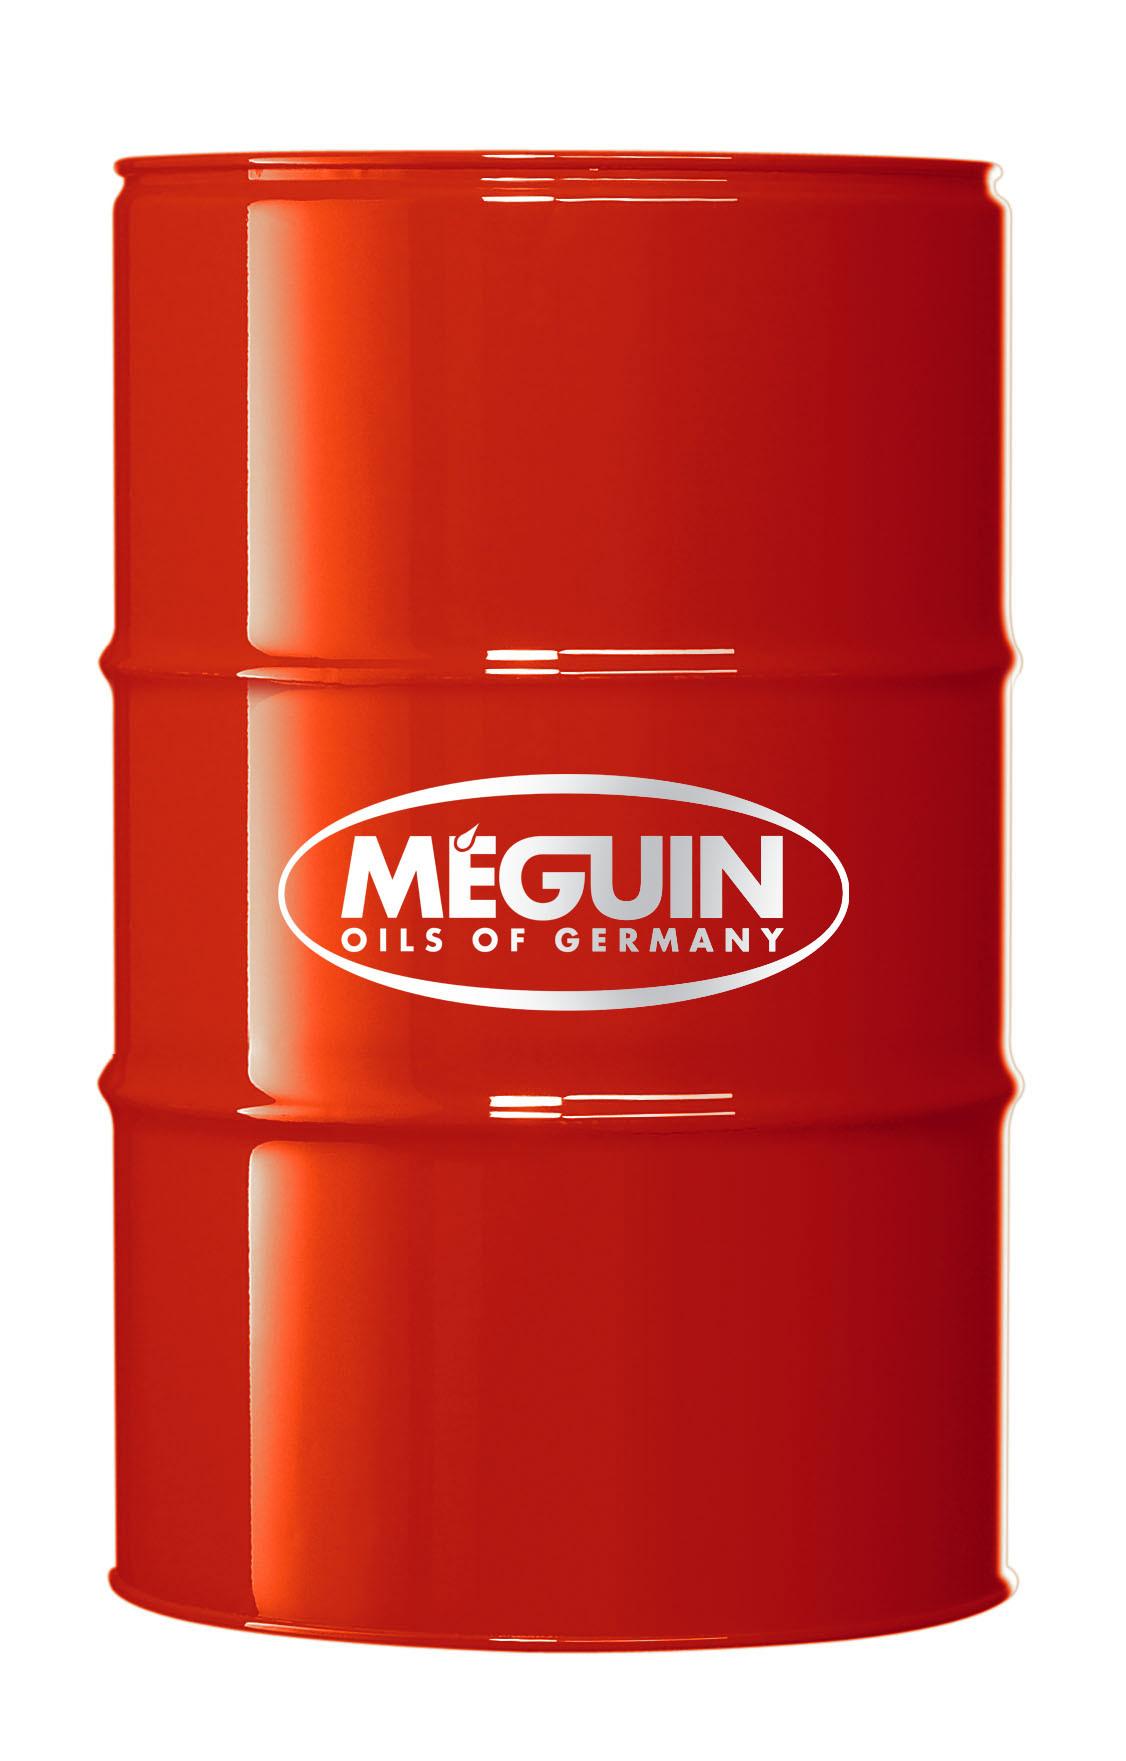 Megol Motorenoil Universal R SAE 15W40 моторное масло для смешанных автопарков